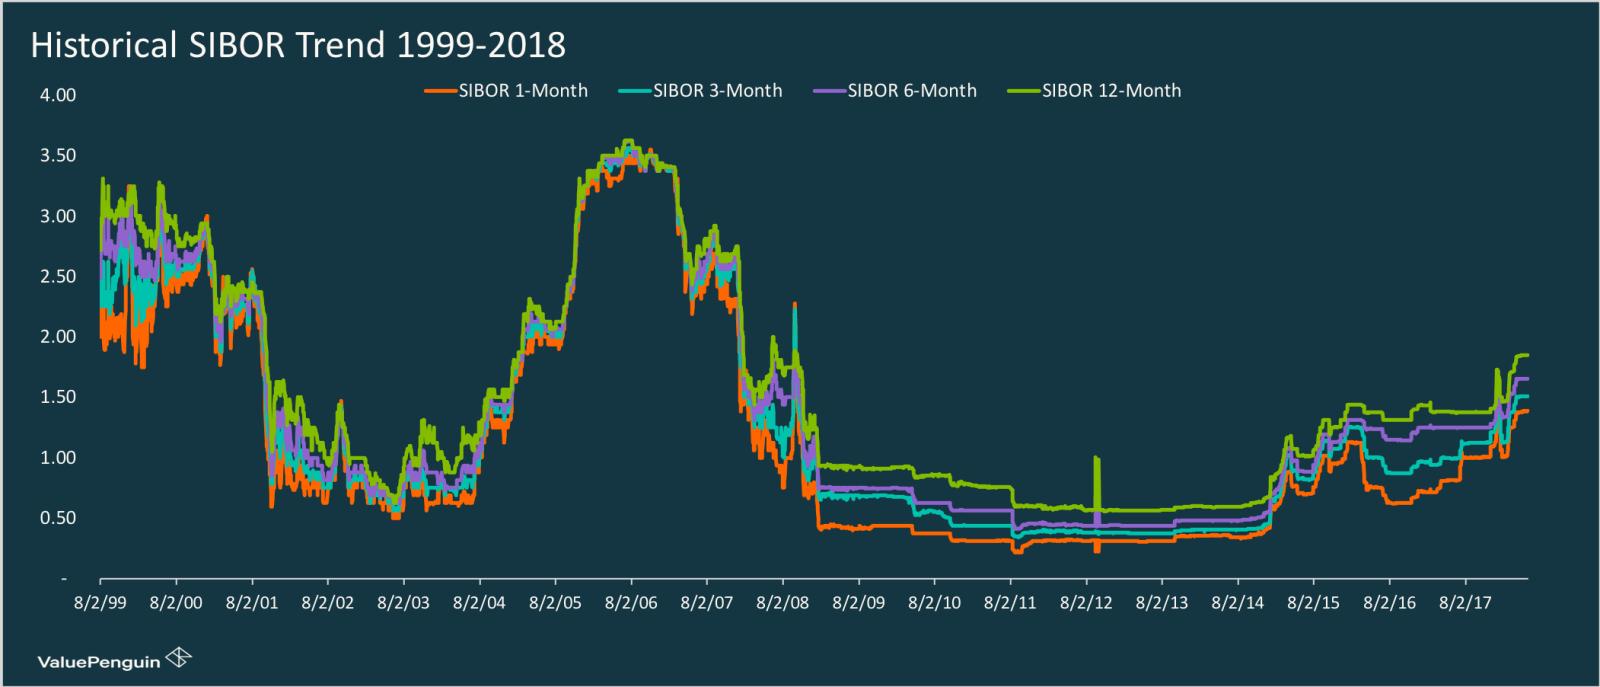 SIBOR Historical Trend 1999-2018